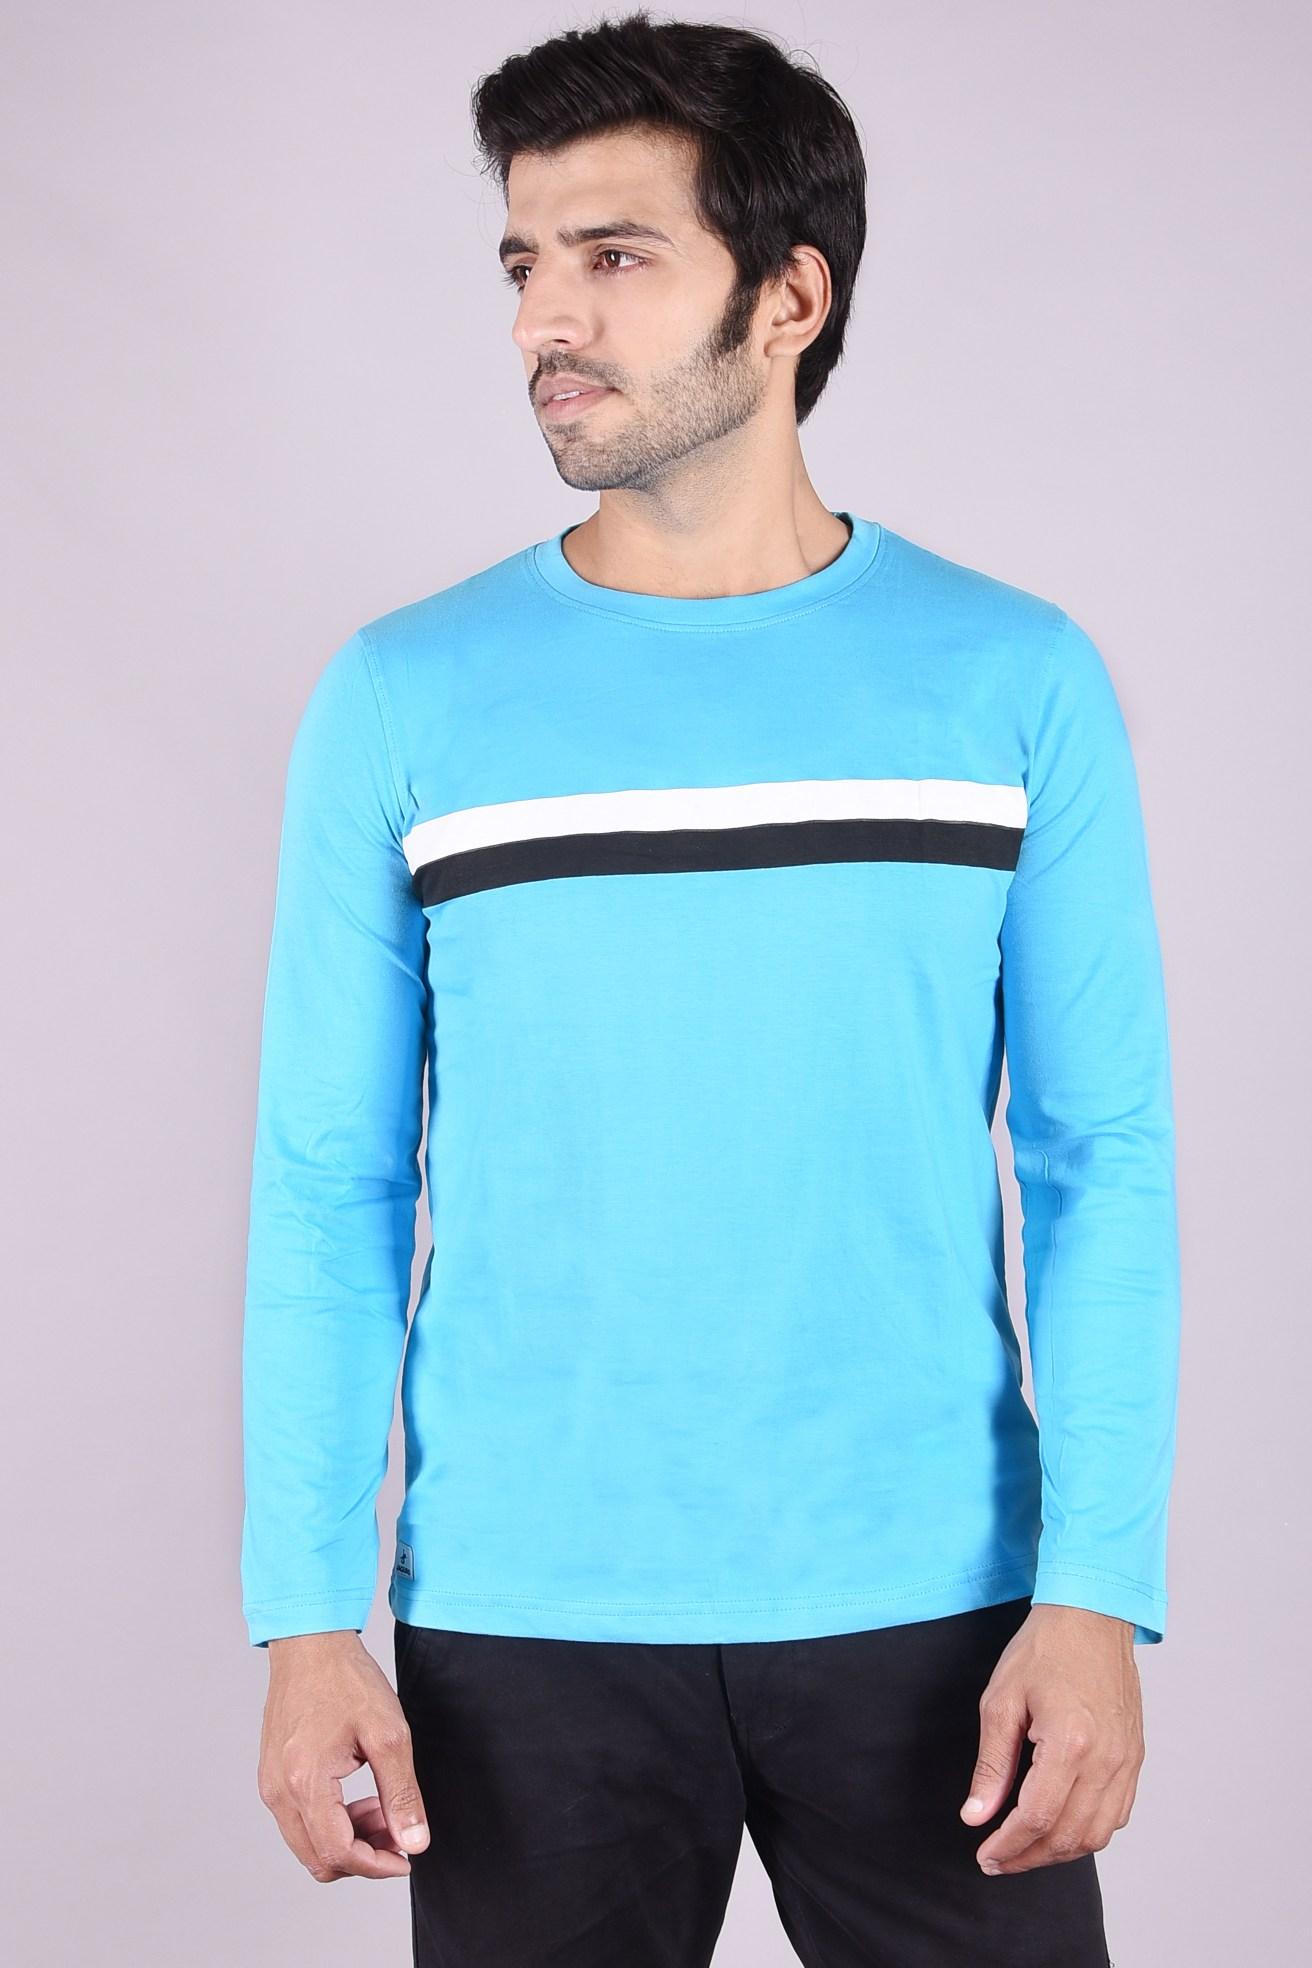 JAGURO   Stylish full Sleeves cotton Printed T-shirt.